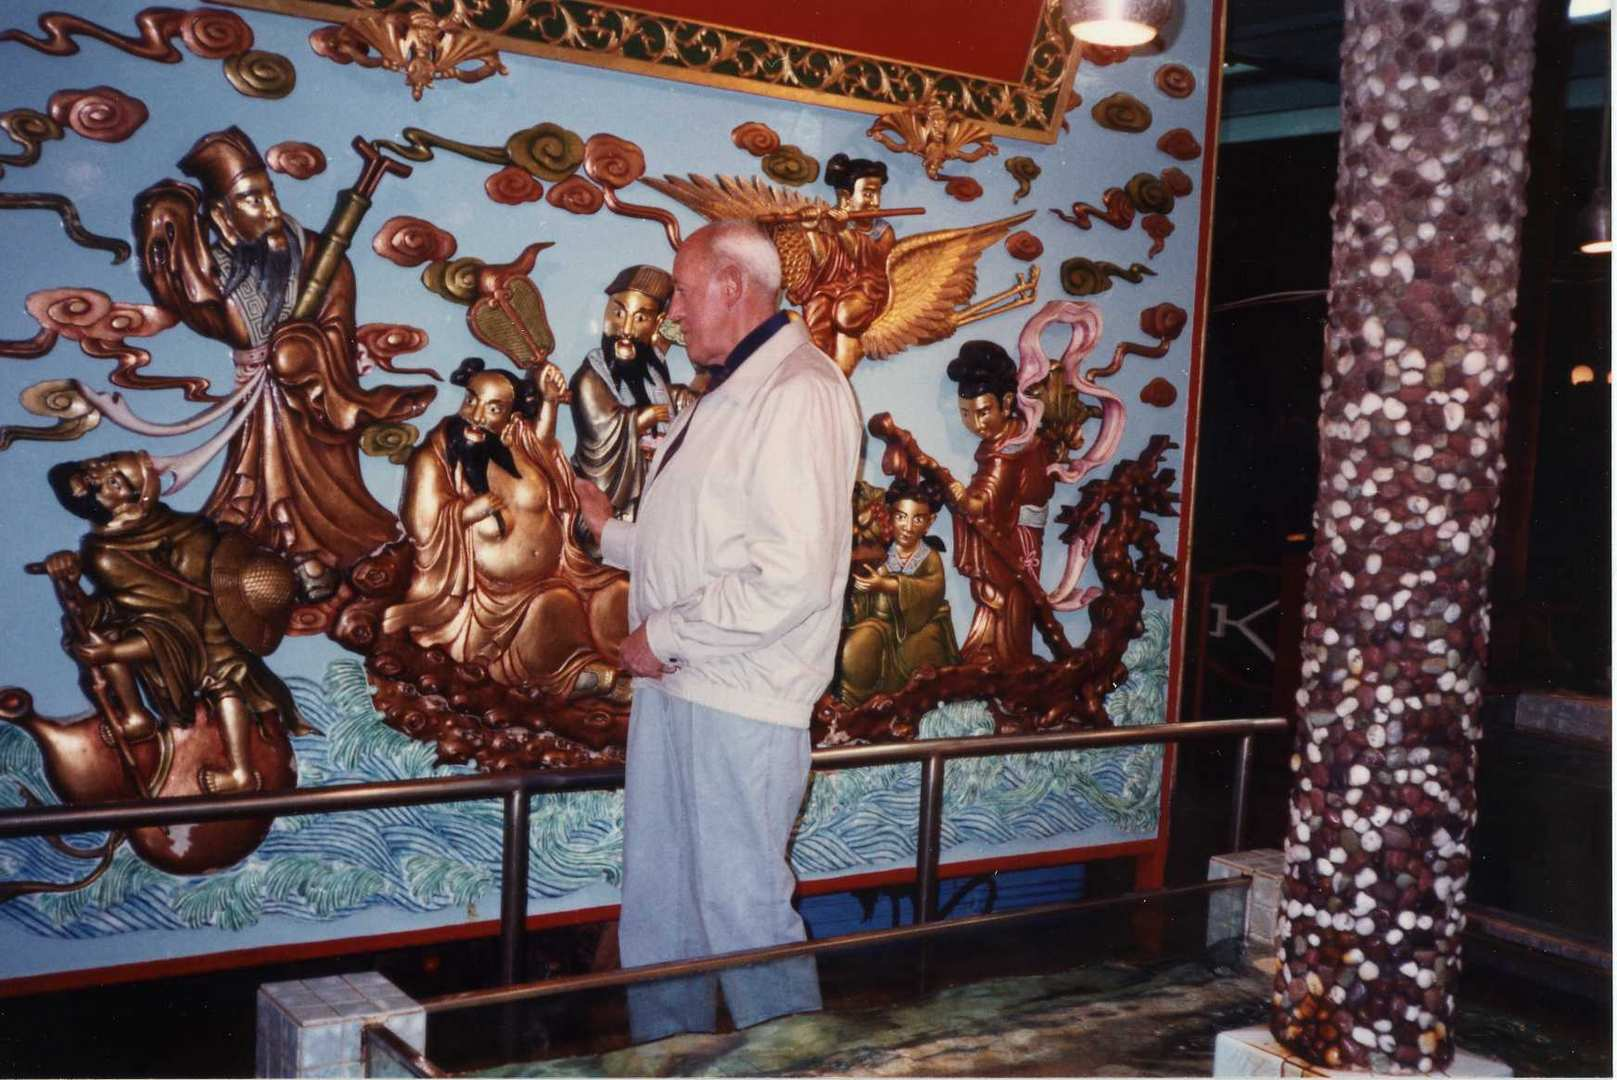 Foto di mio padre: Cina, 1985